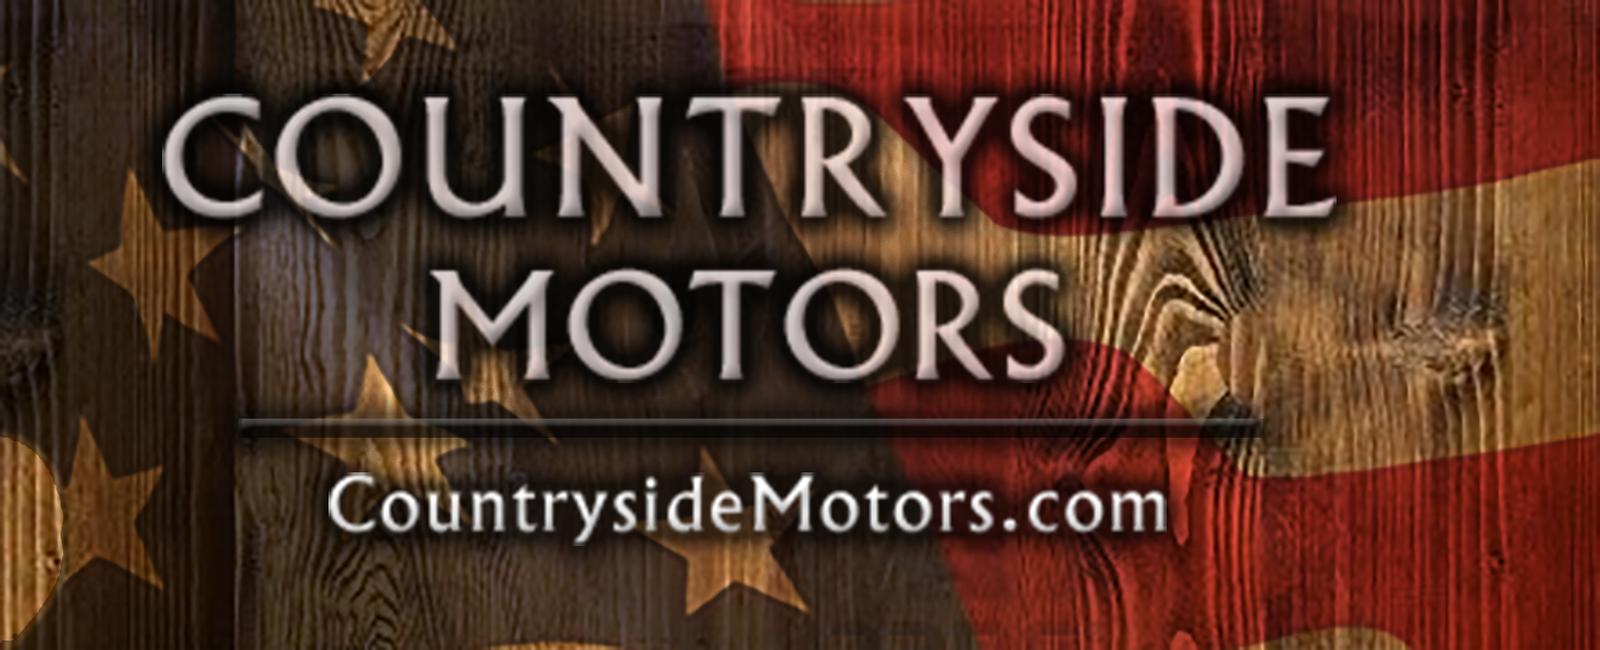 Countryside Motors Arkansas